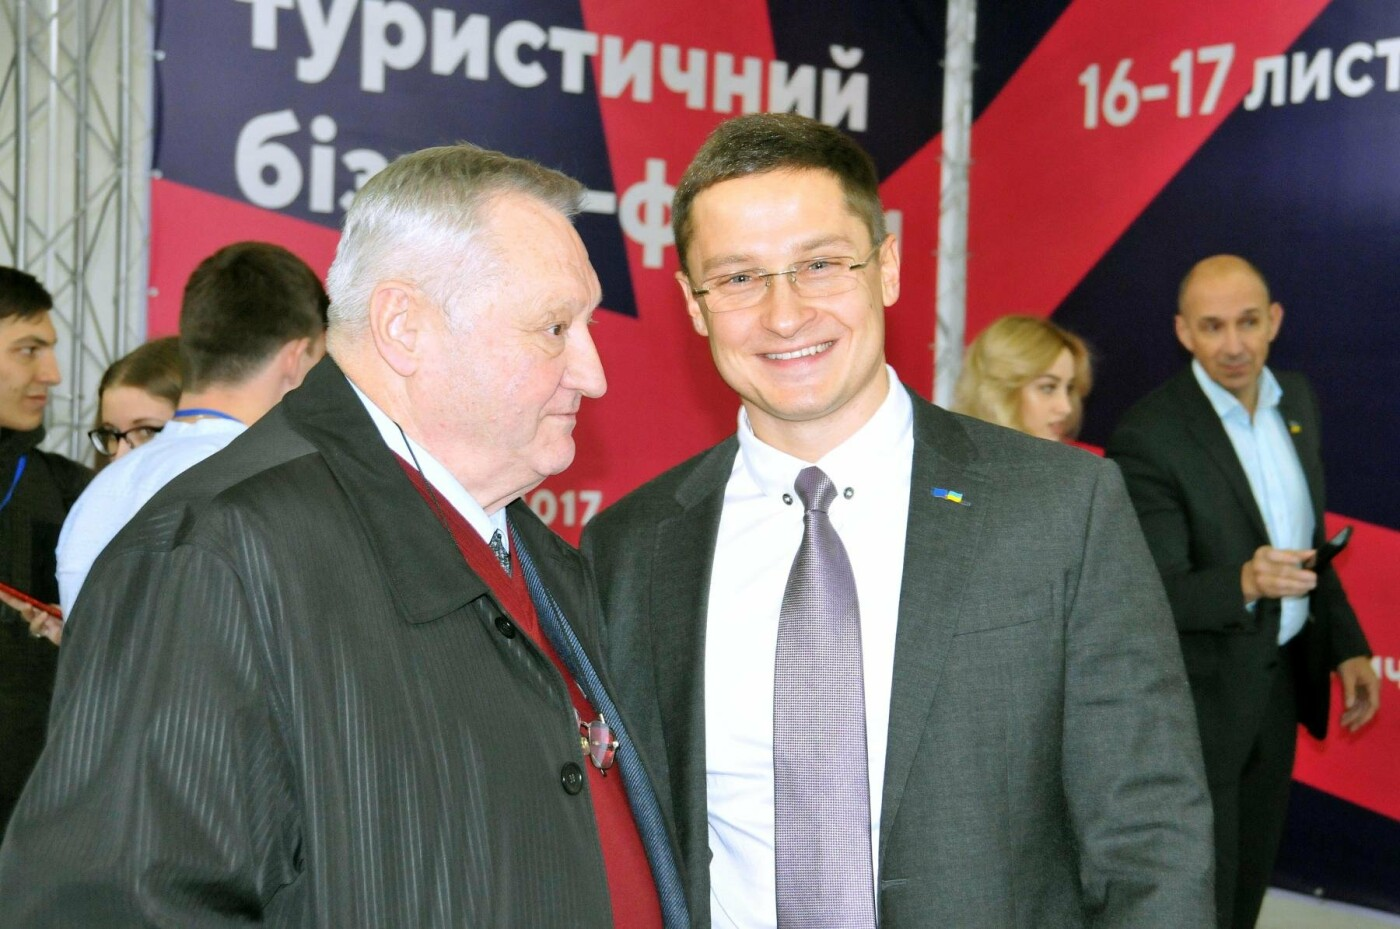 Владислав Марченко: «Запорожский край - перспективный центр туризма», фото-3